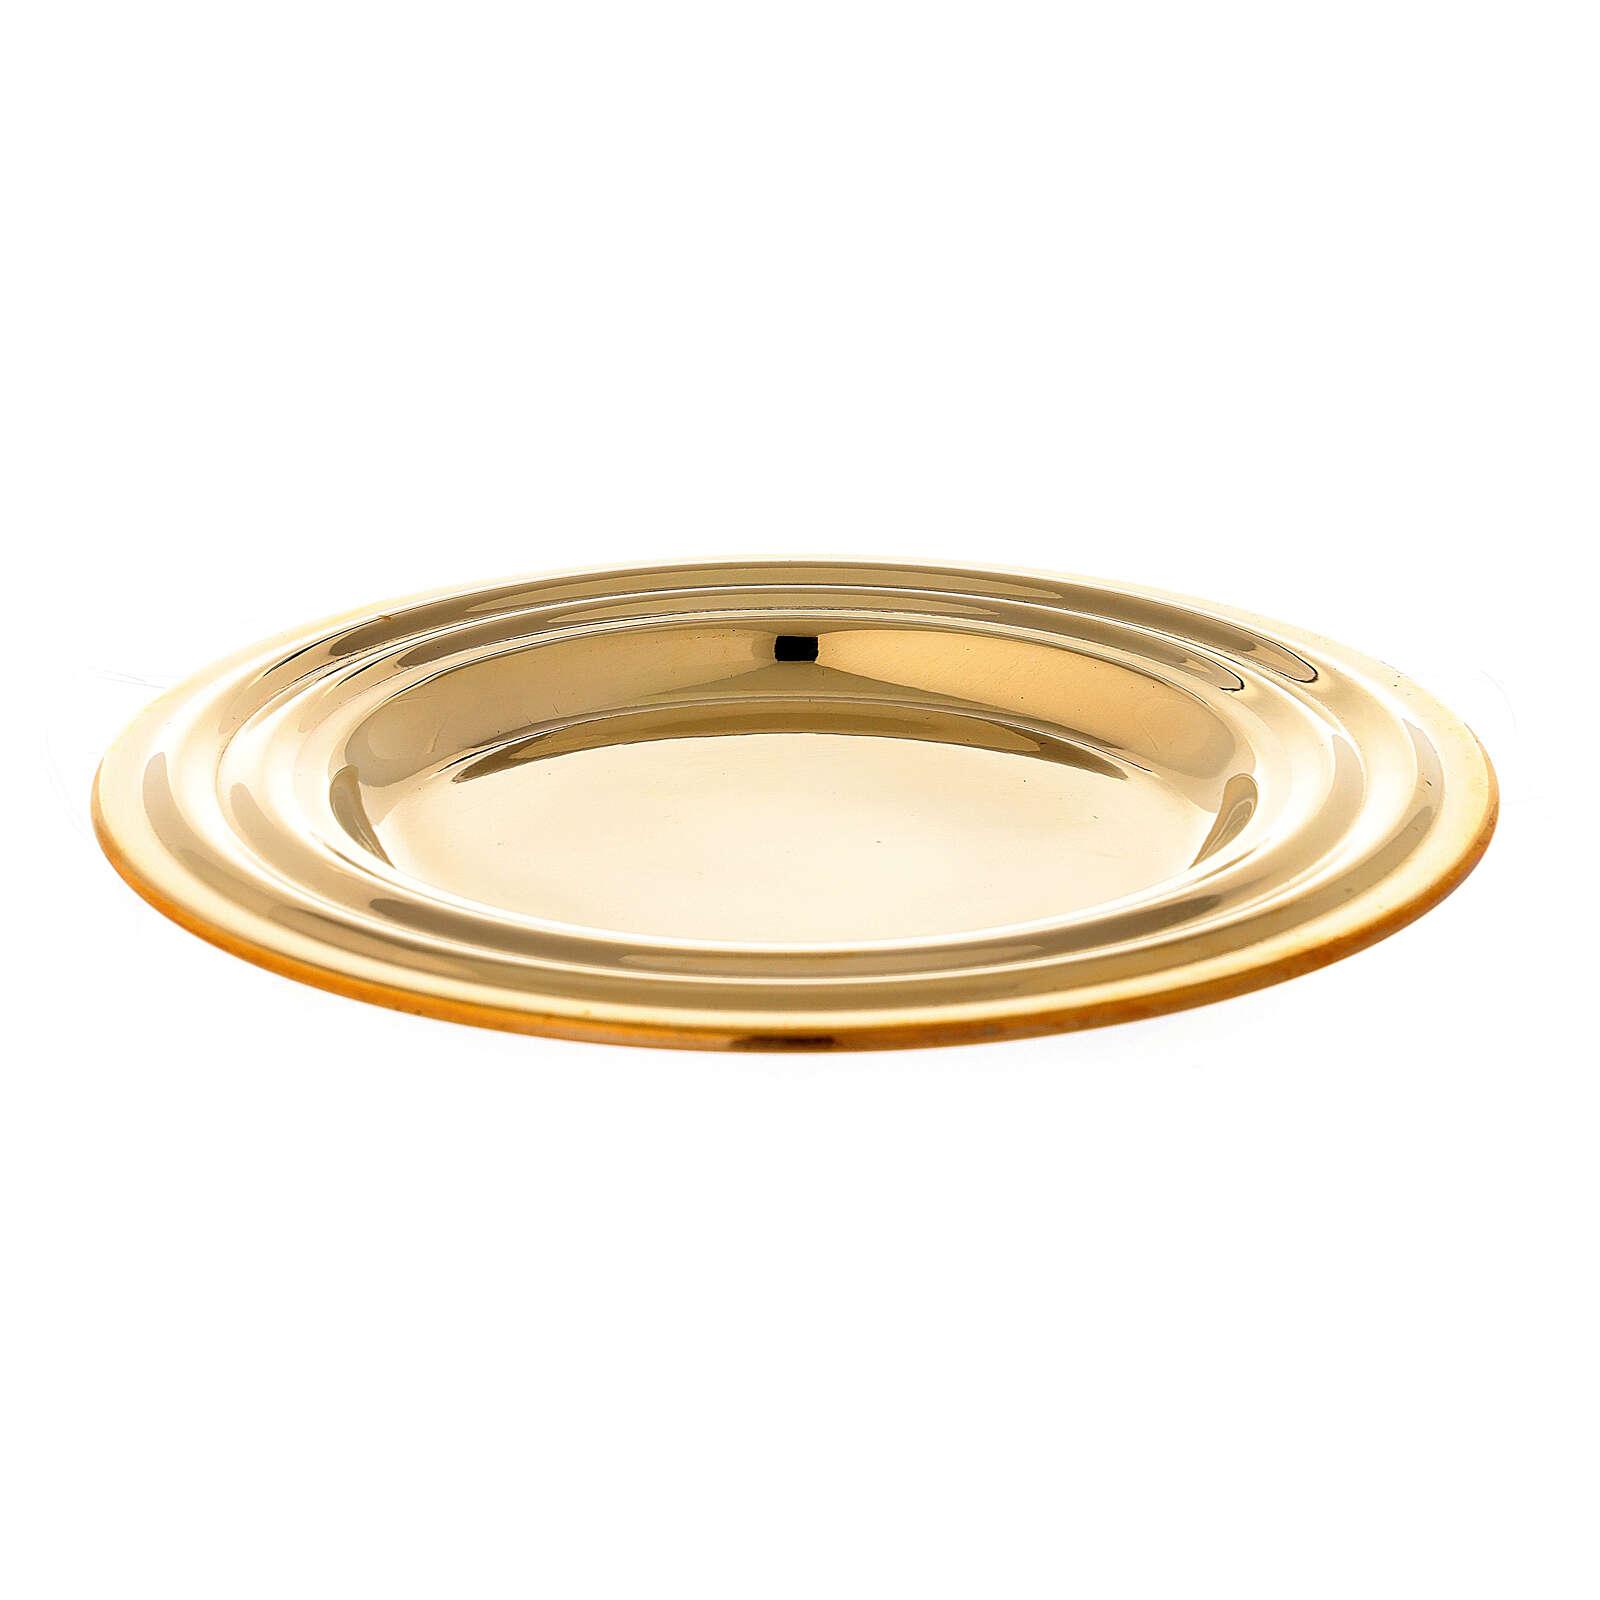 Round golden brass candle holder plate diameter 13 cm 3